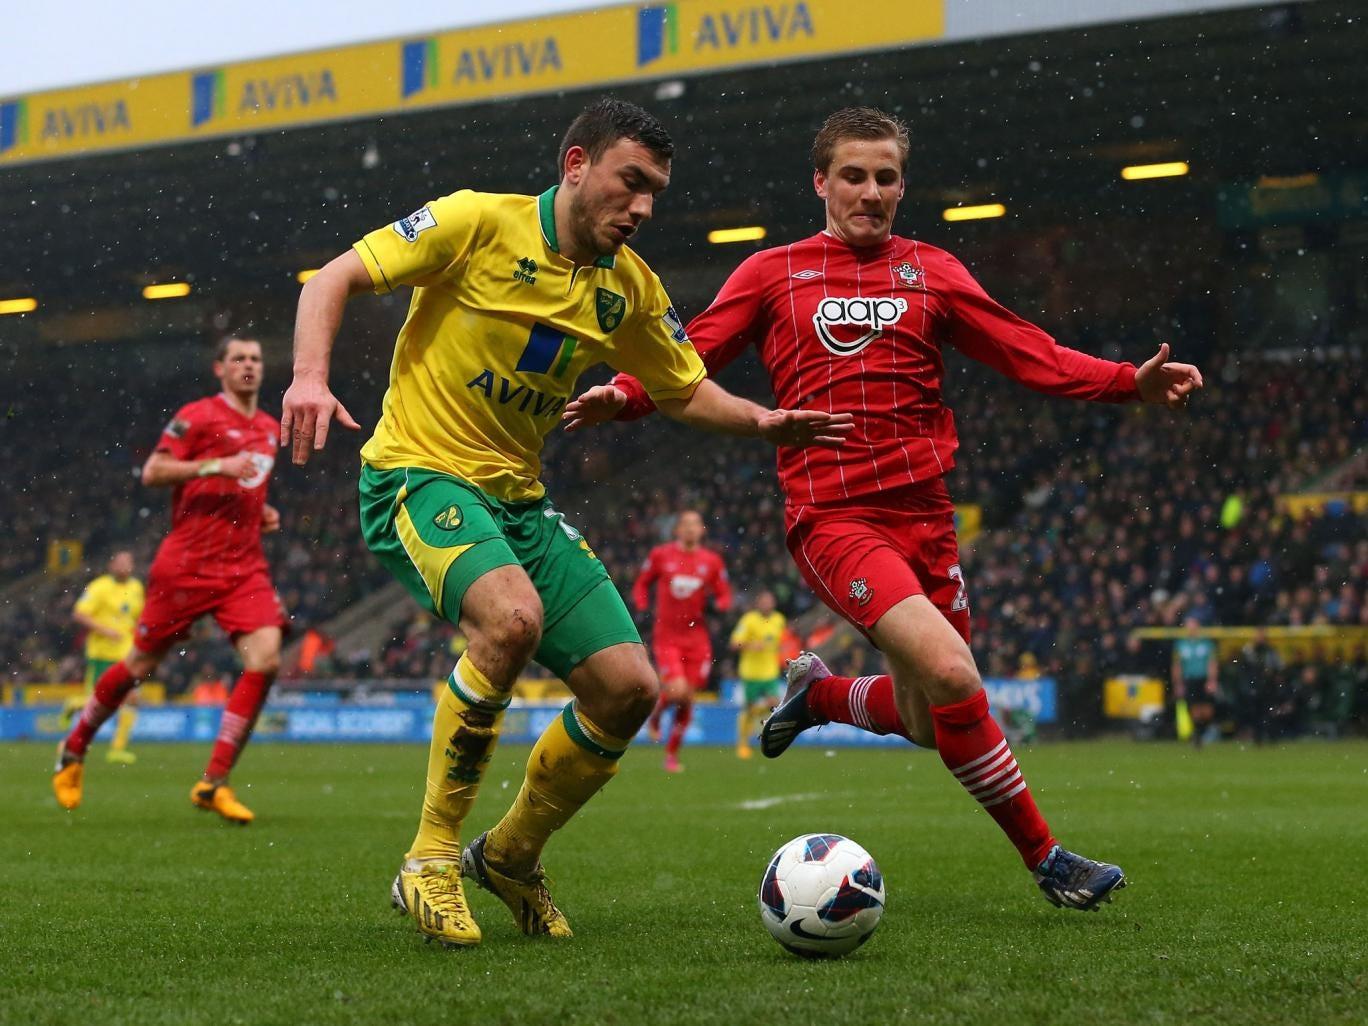 Robert Snodgrass of Norwich City battles with Luke Shaw of Southampton